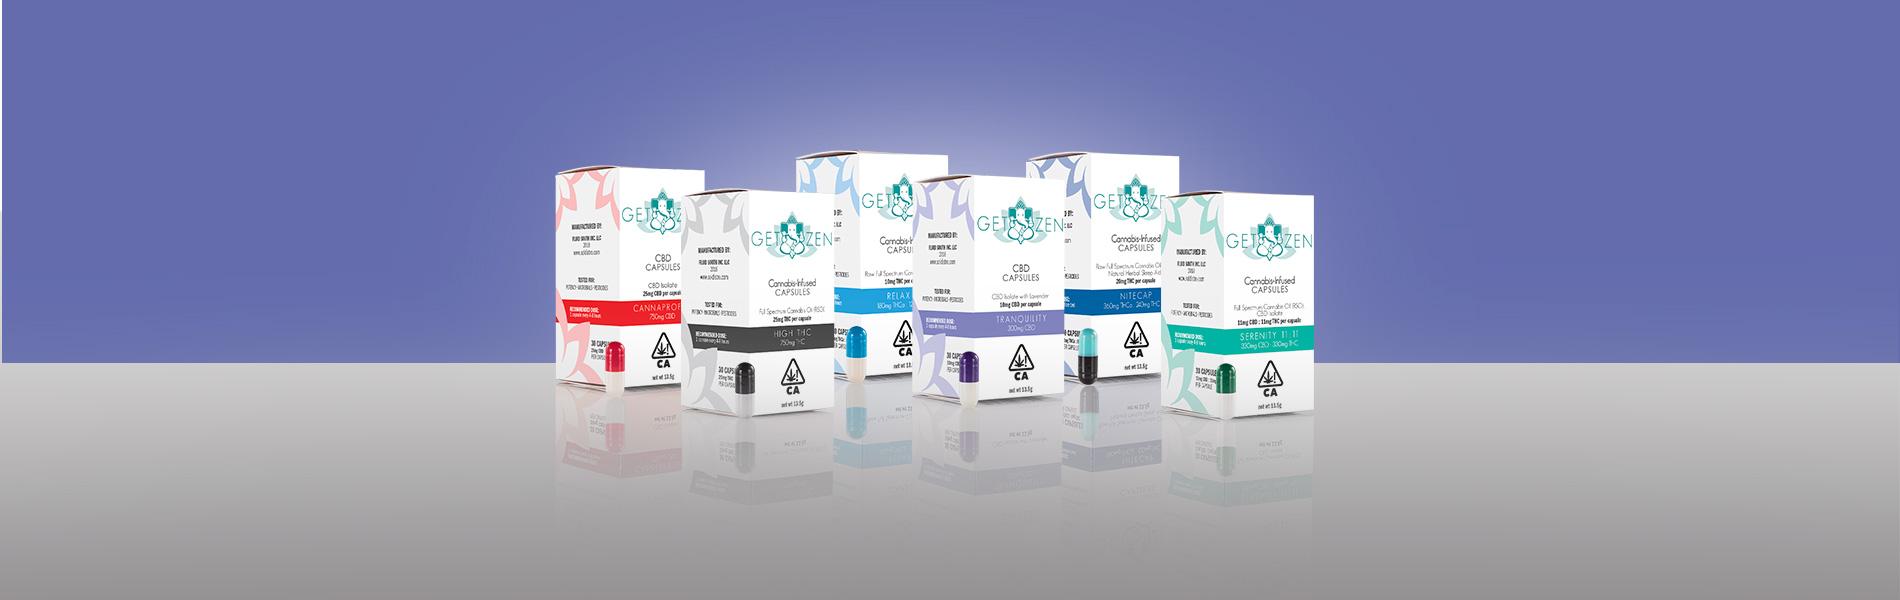 get zen medicinal cannabis capsules group image